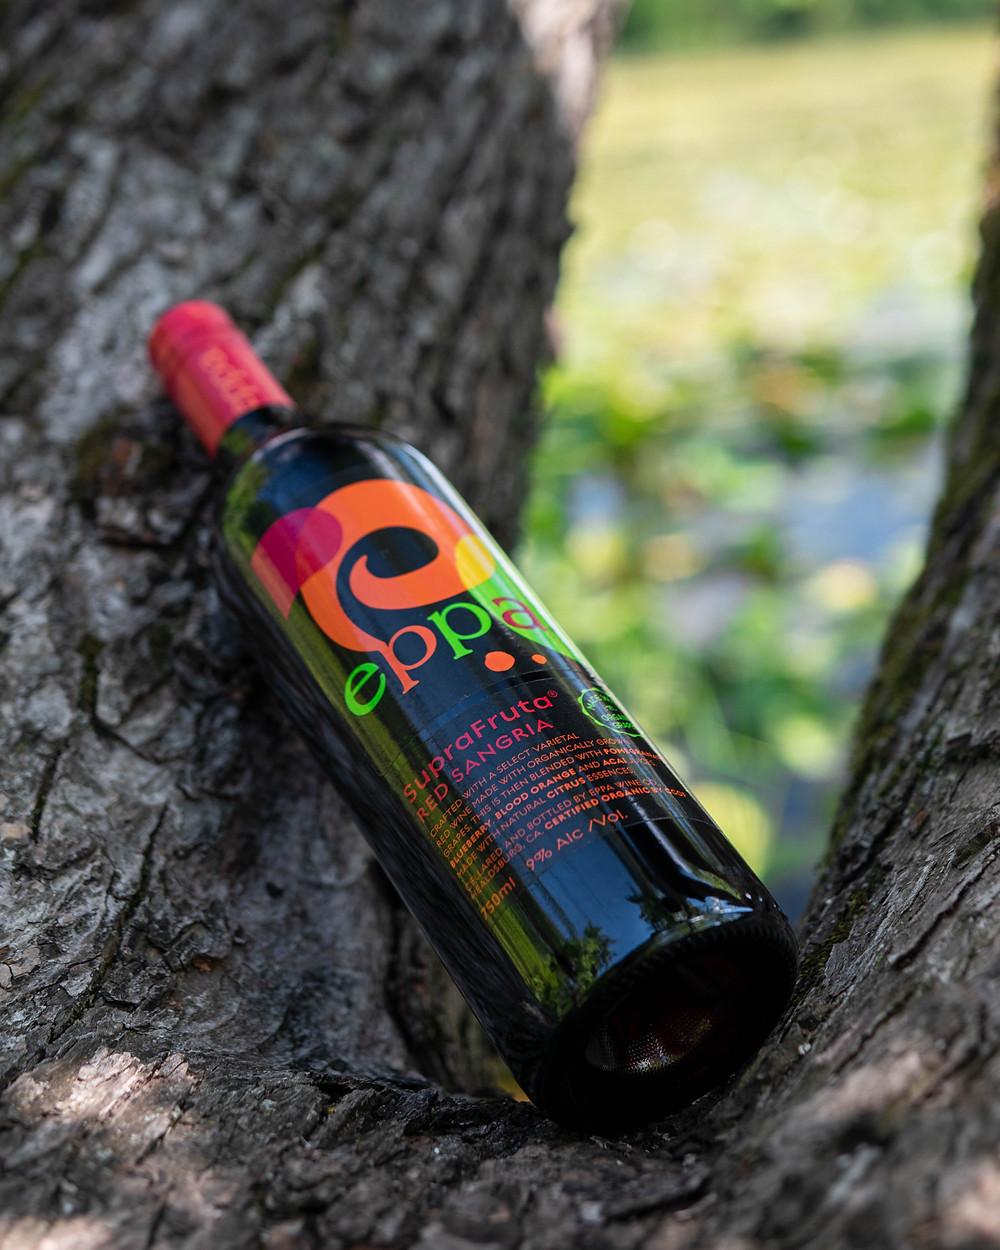 Eppa SupraFruta Red Sangria In a tree